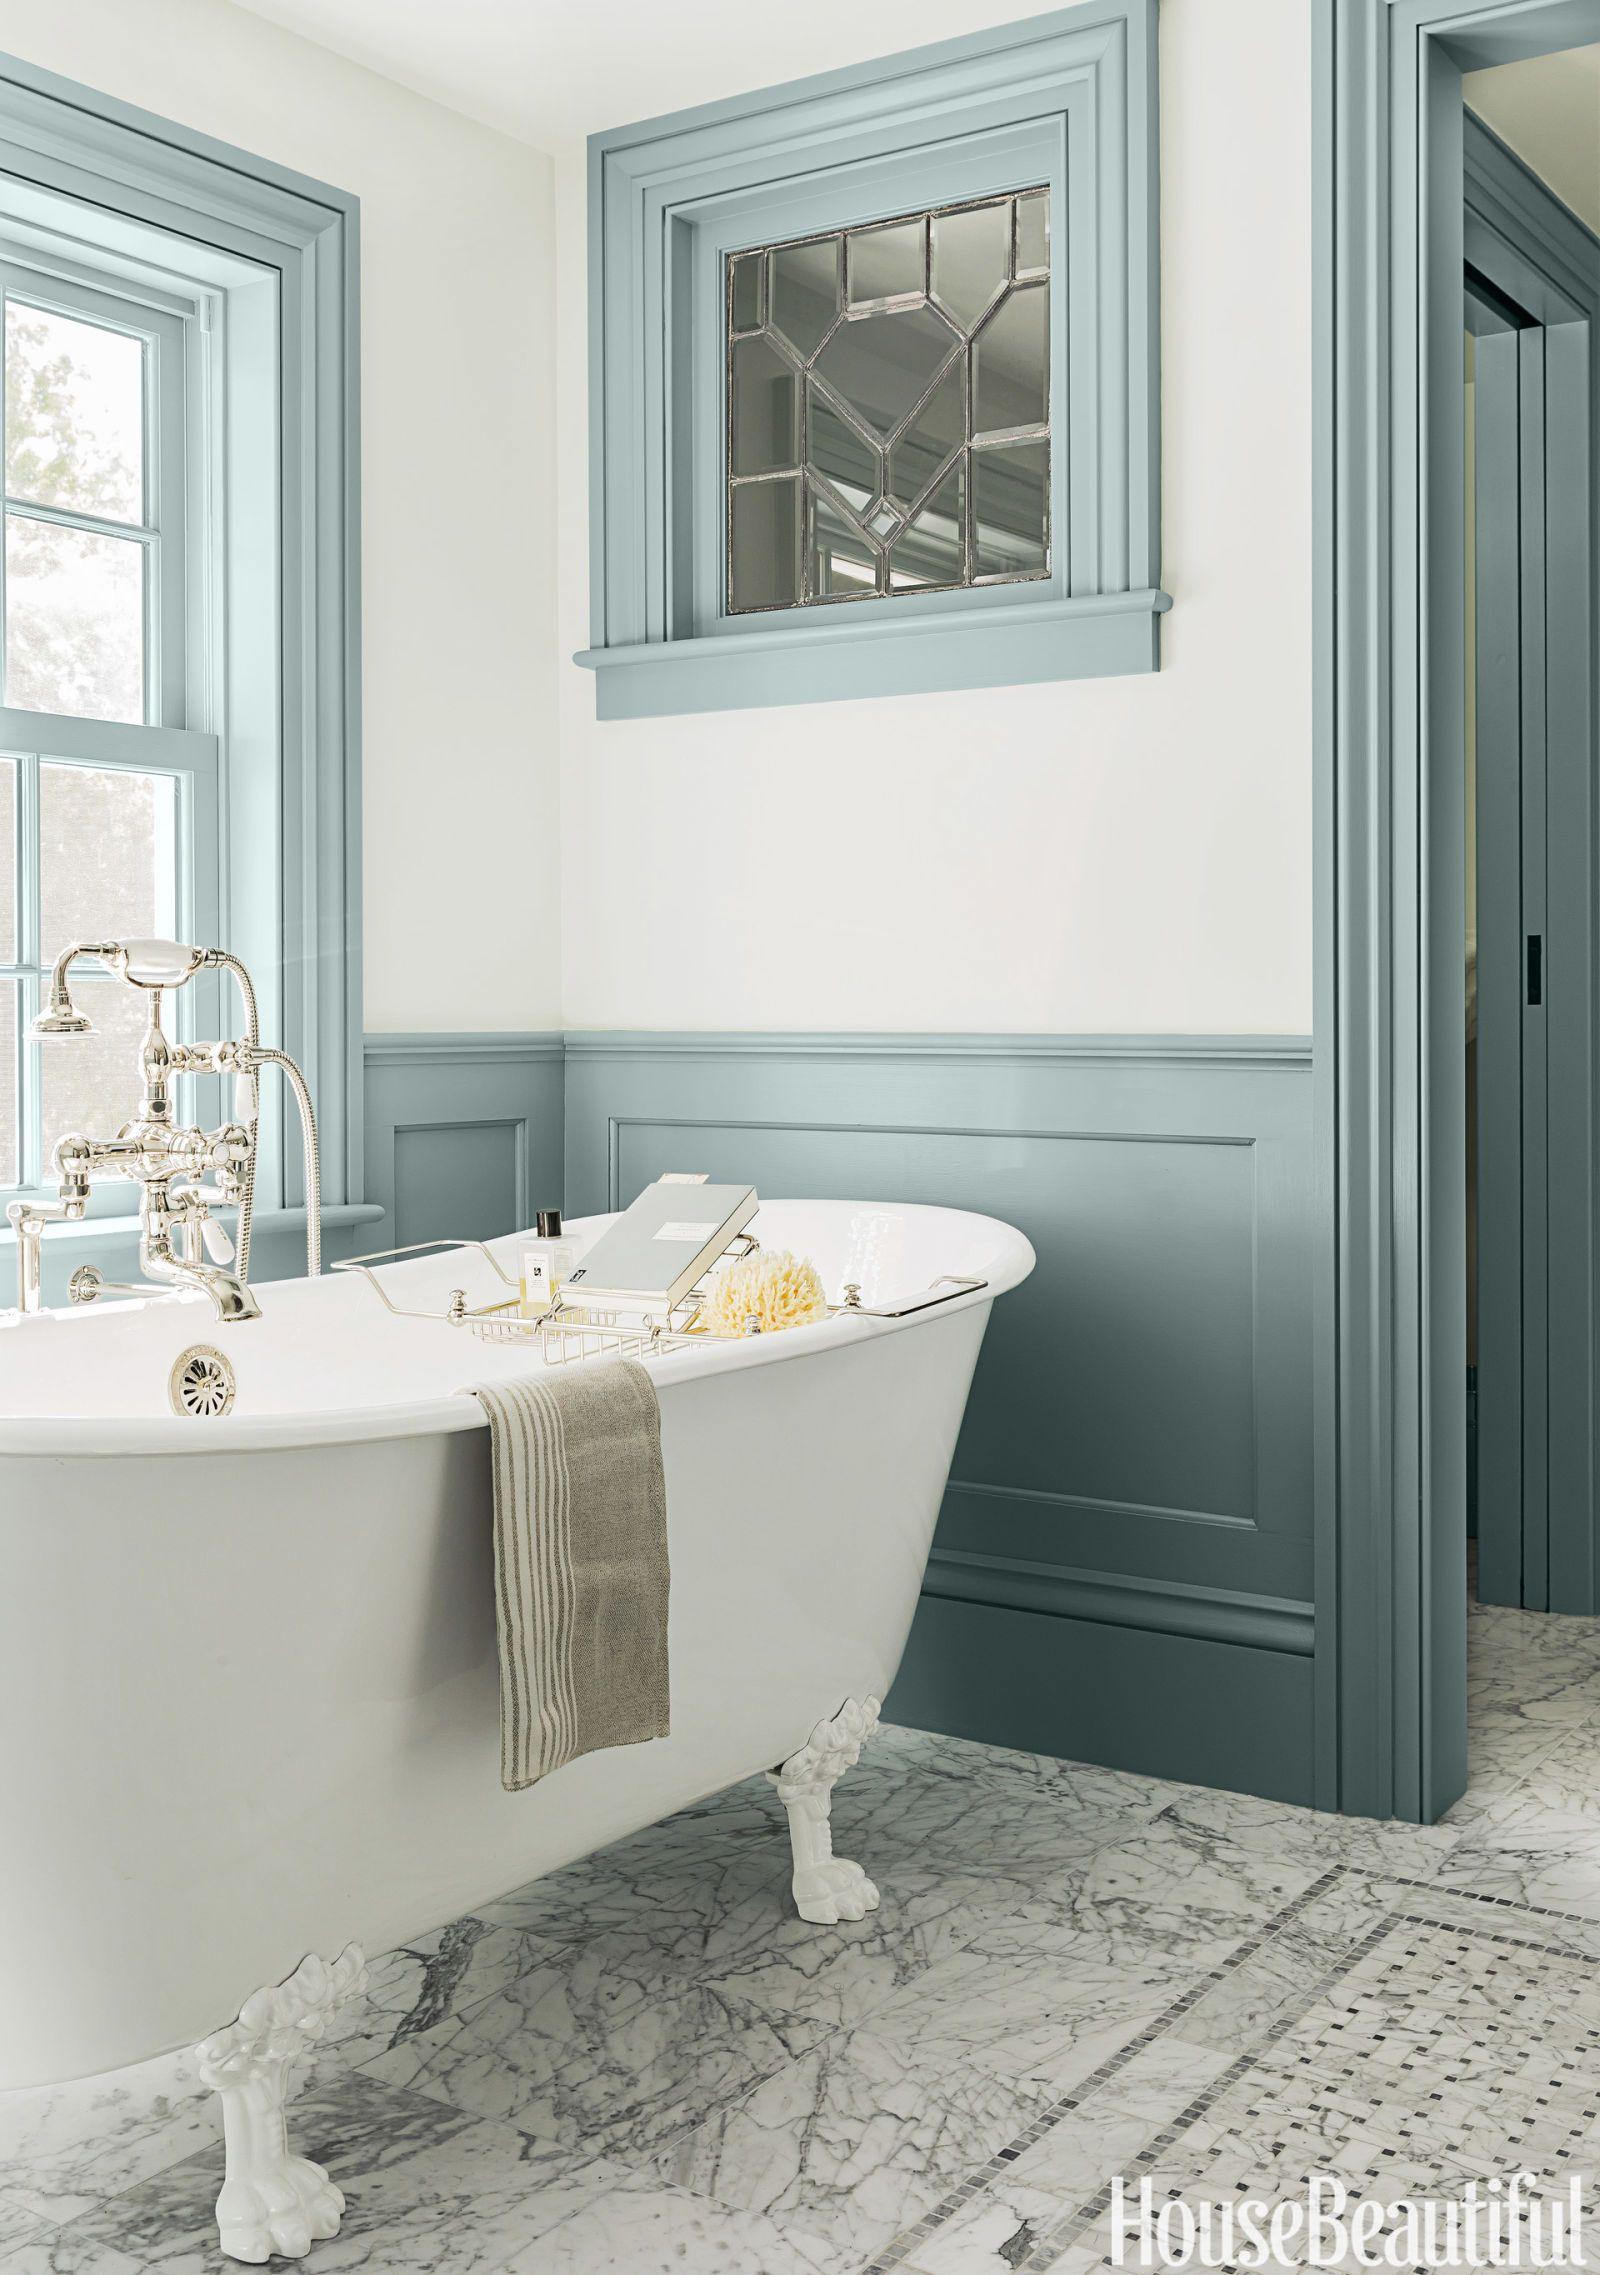 Bathroom cabinets colors - Bathroom Cabinets Colors 39